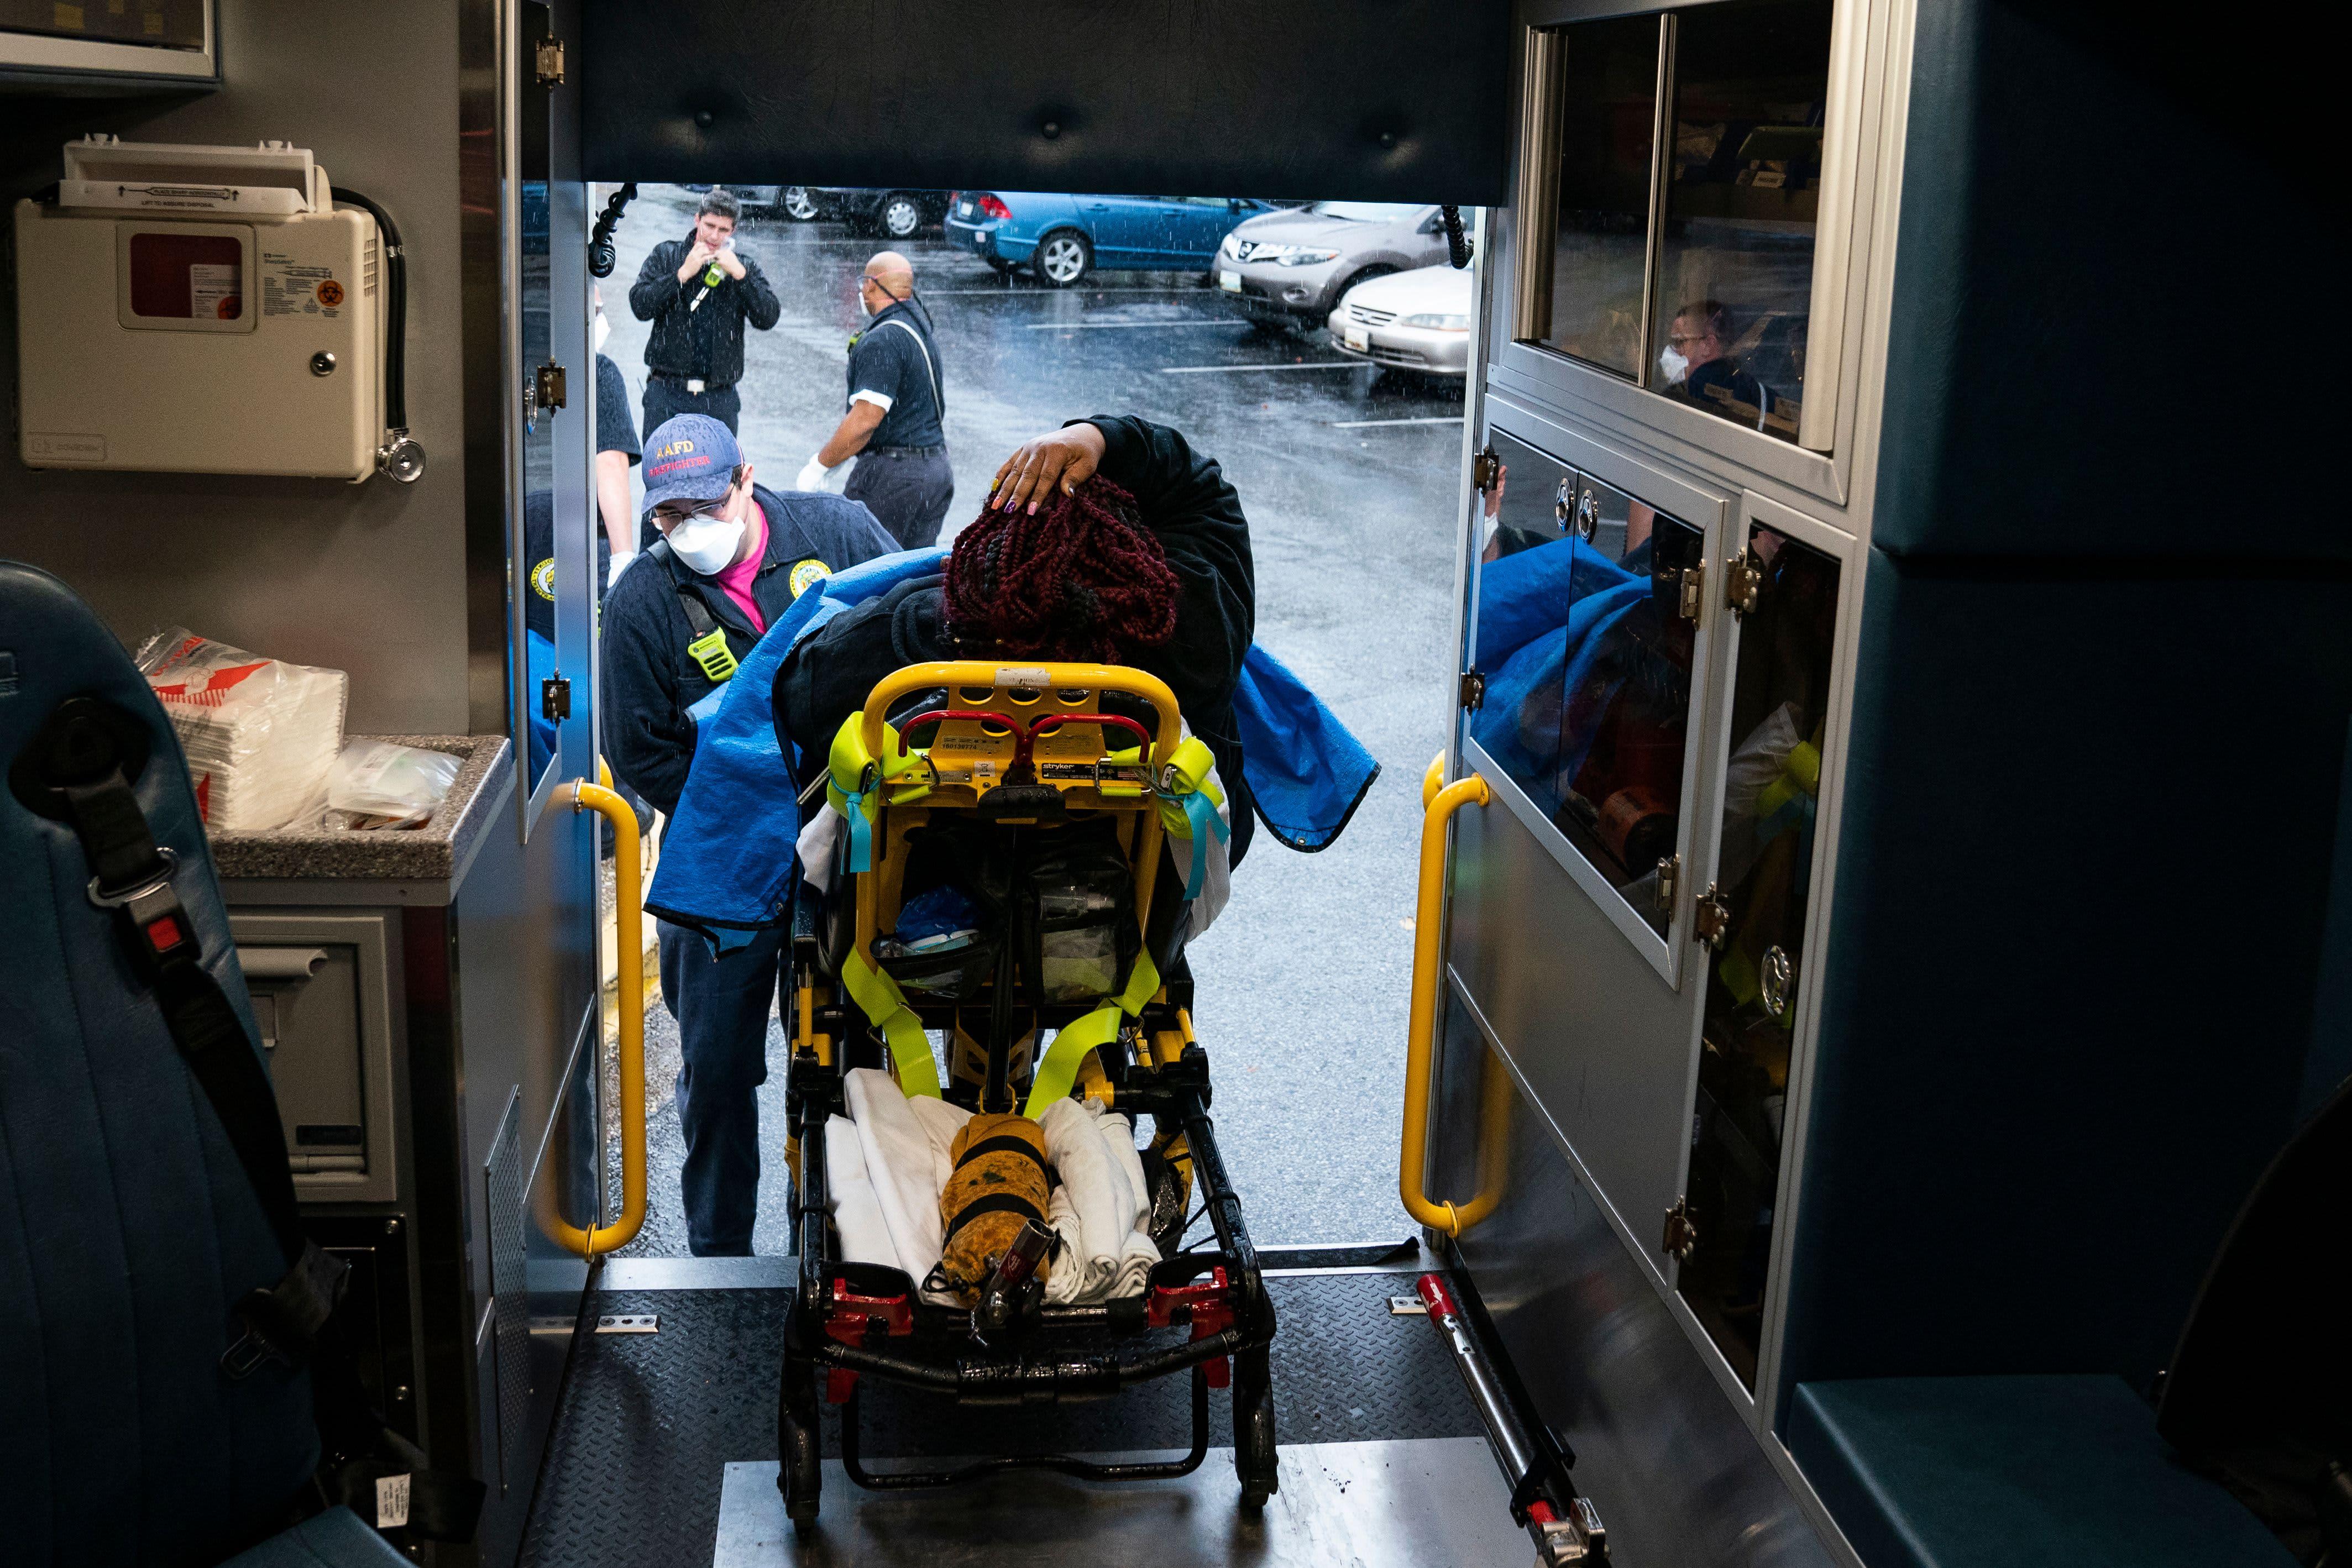 Paramedics under 'extreme stress' as toll of Covid pandemic climbs, ambulance company CEOs say